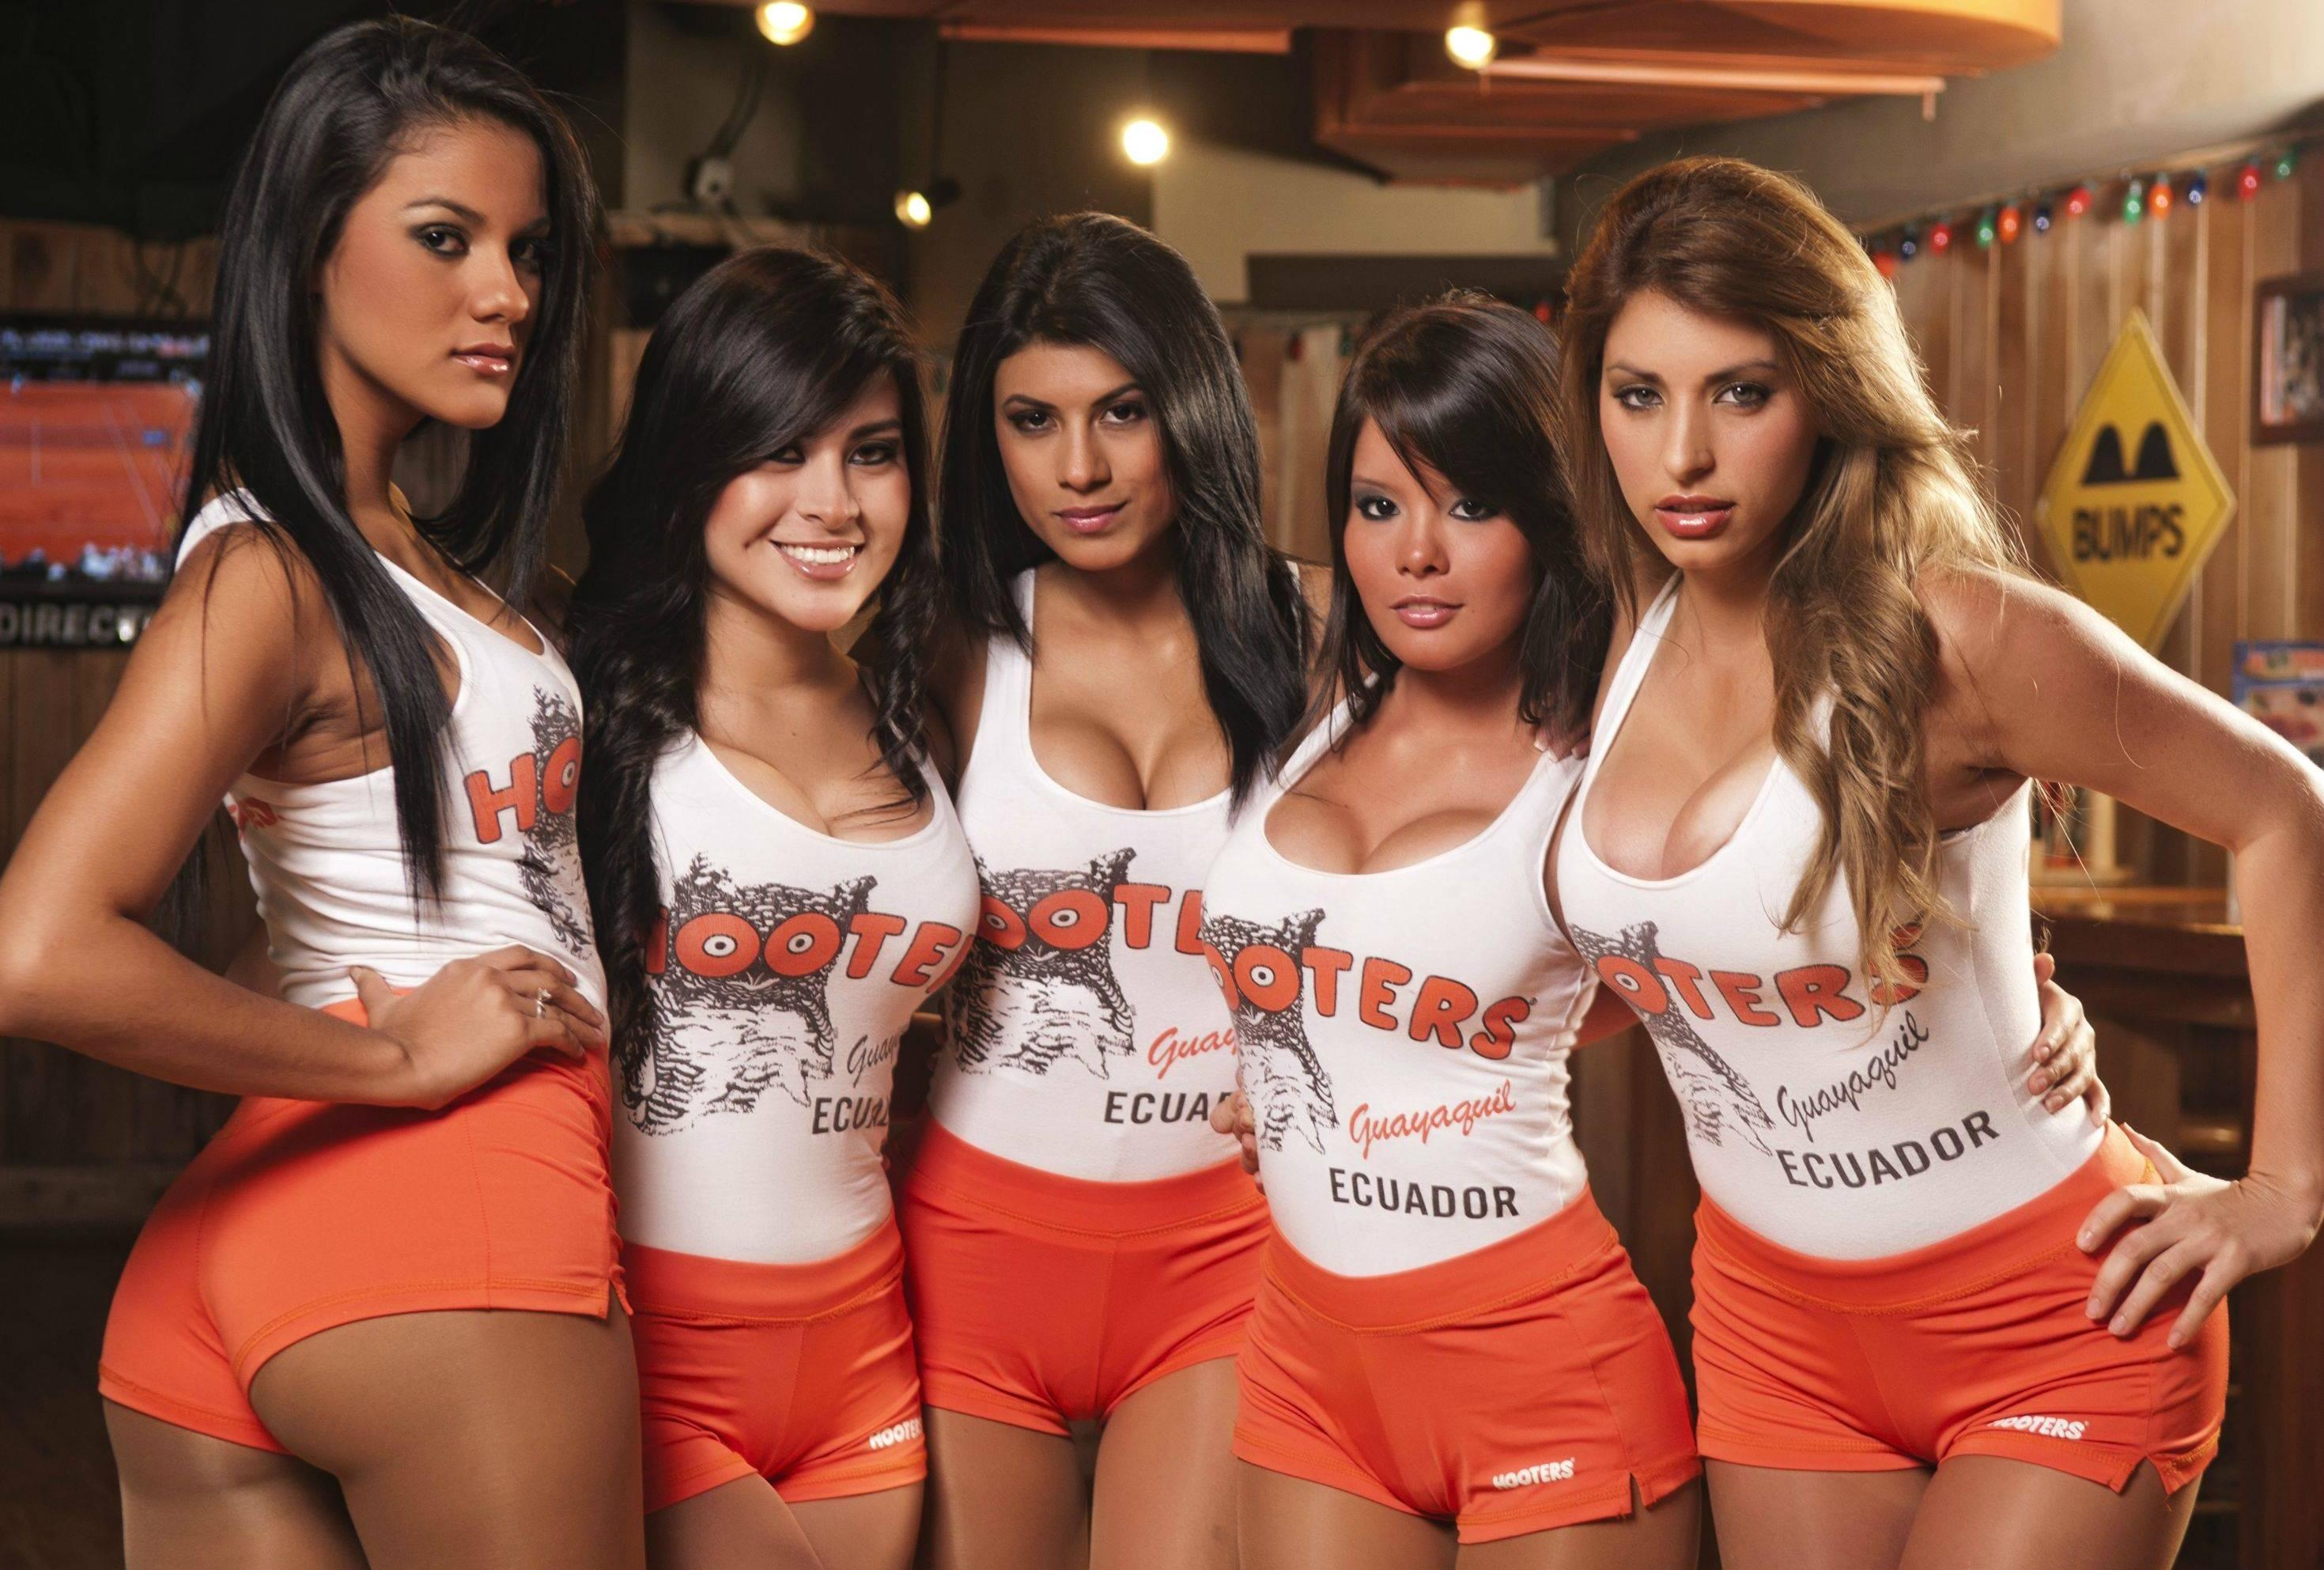 Latina hooters